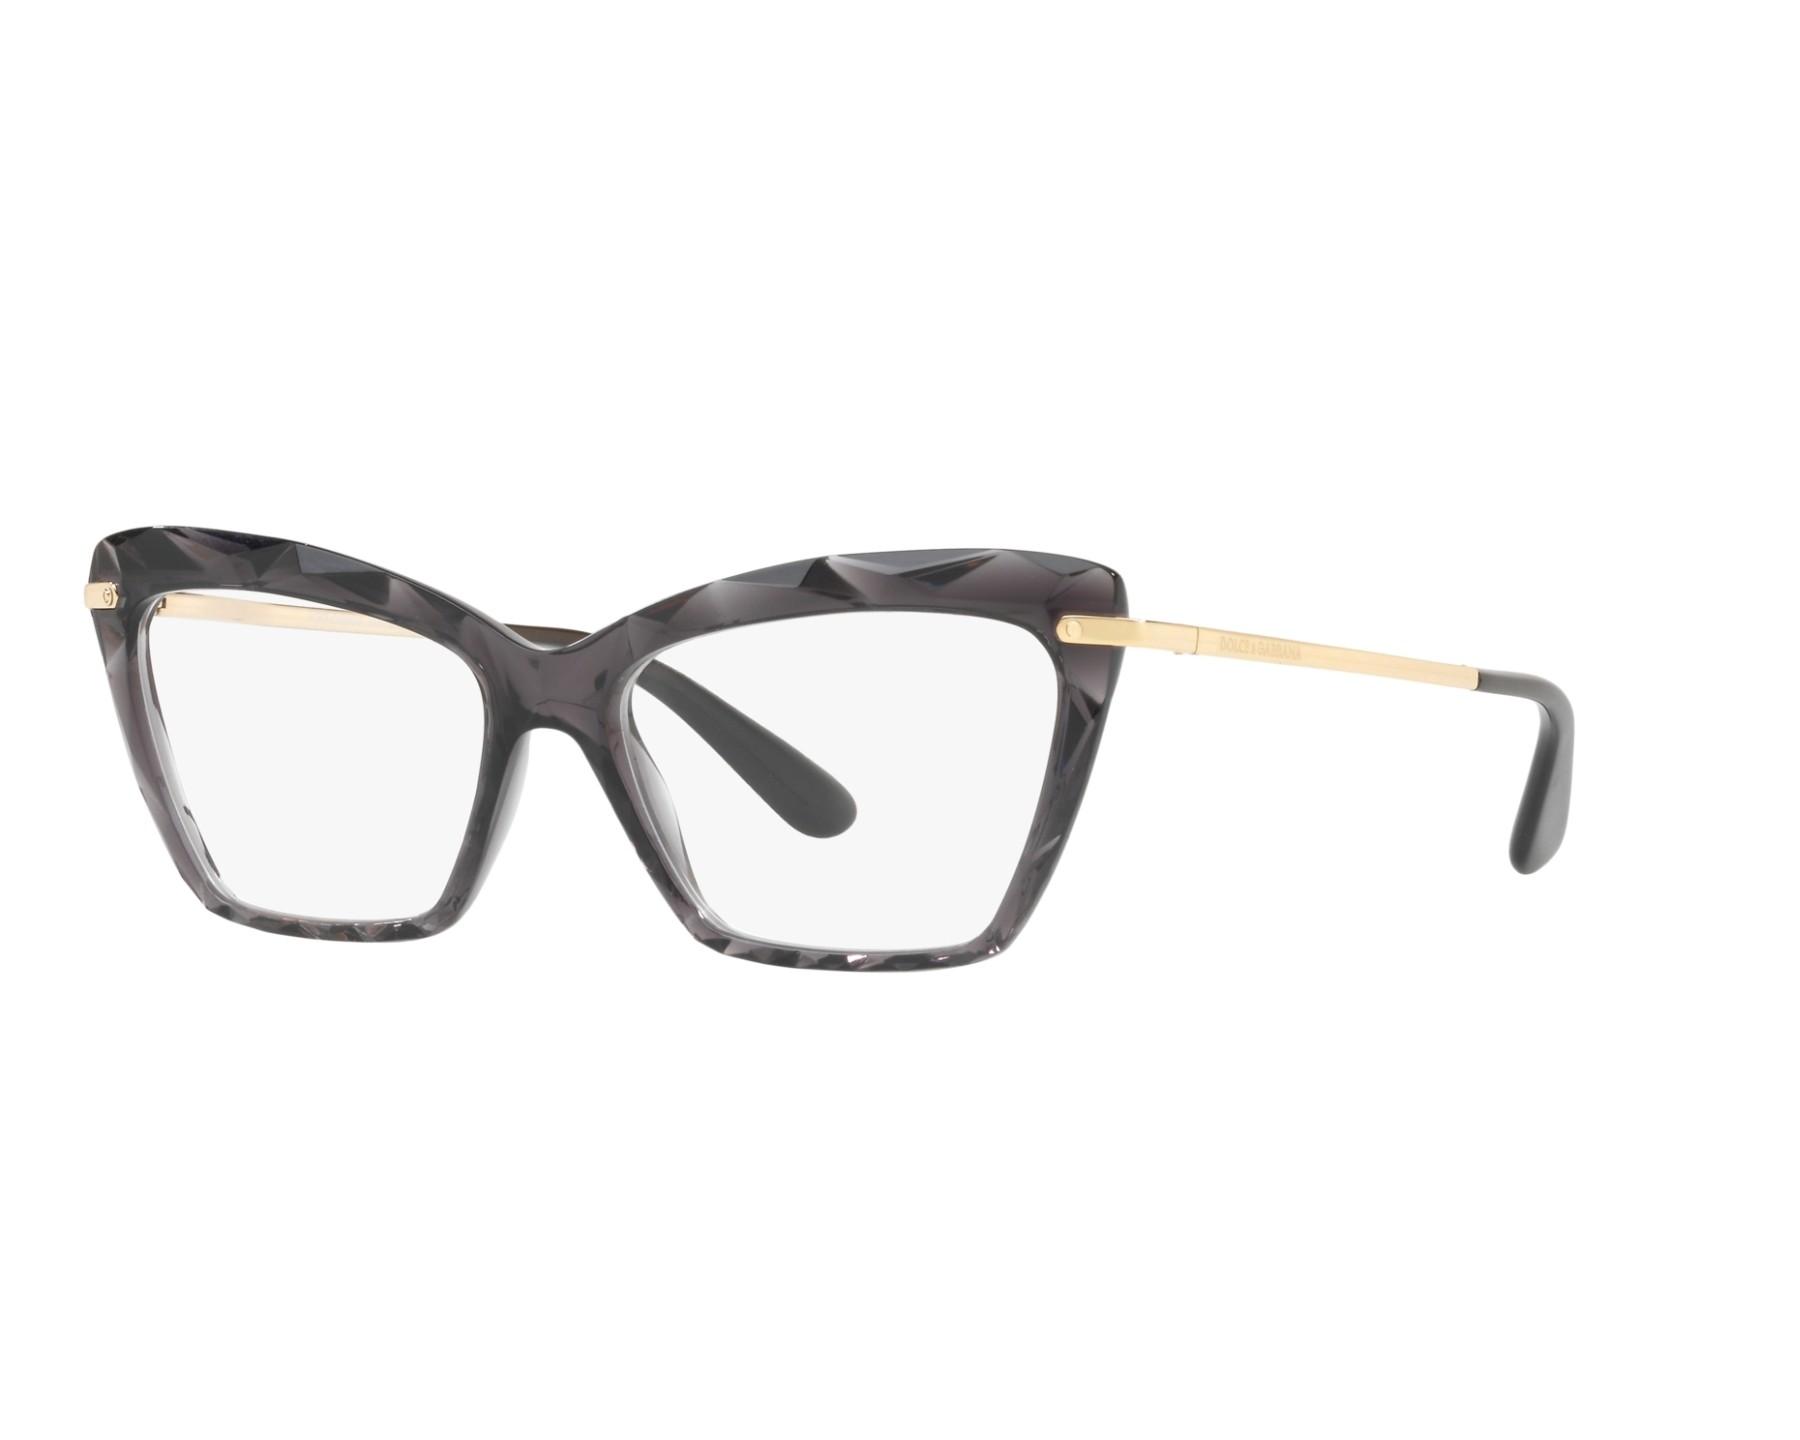 eyeglasses Dolce   Gabbana DG-5025 504 53-15 Black Gold c2e7ee475a